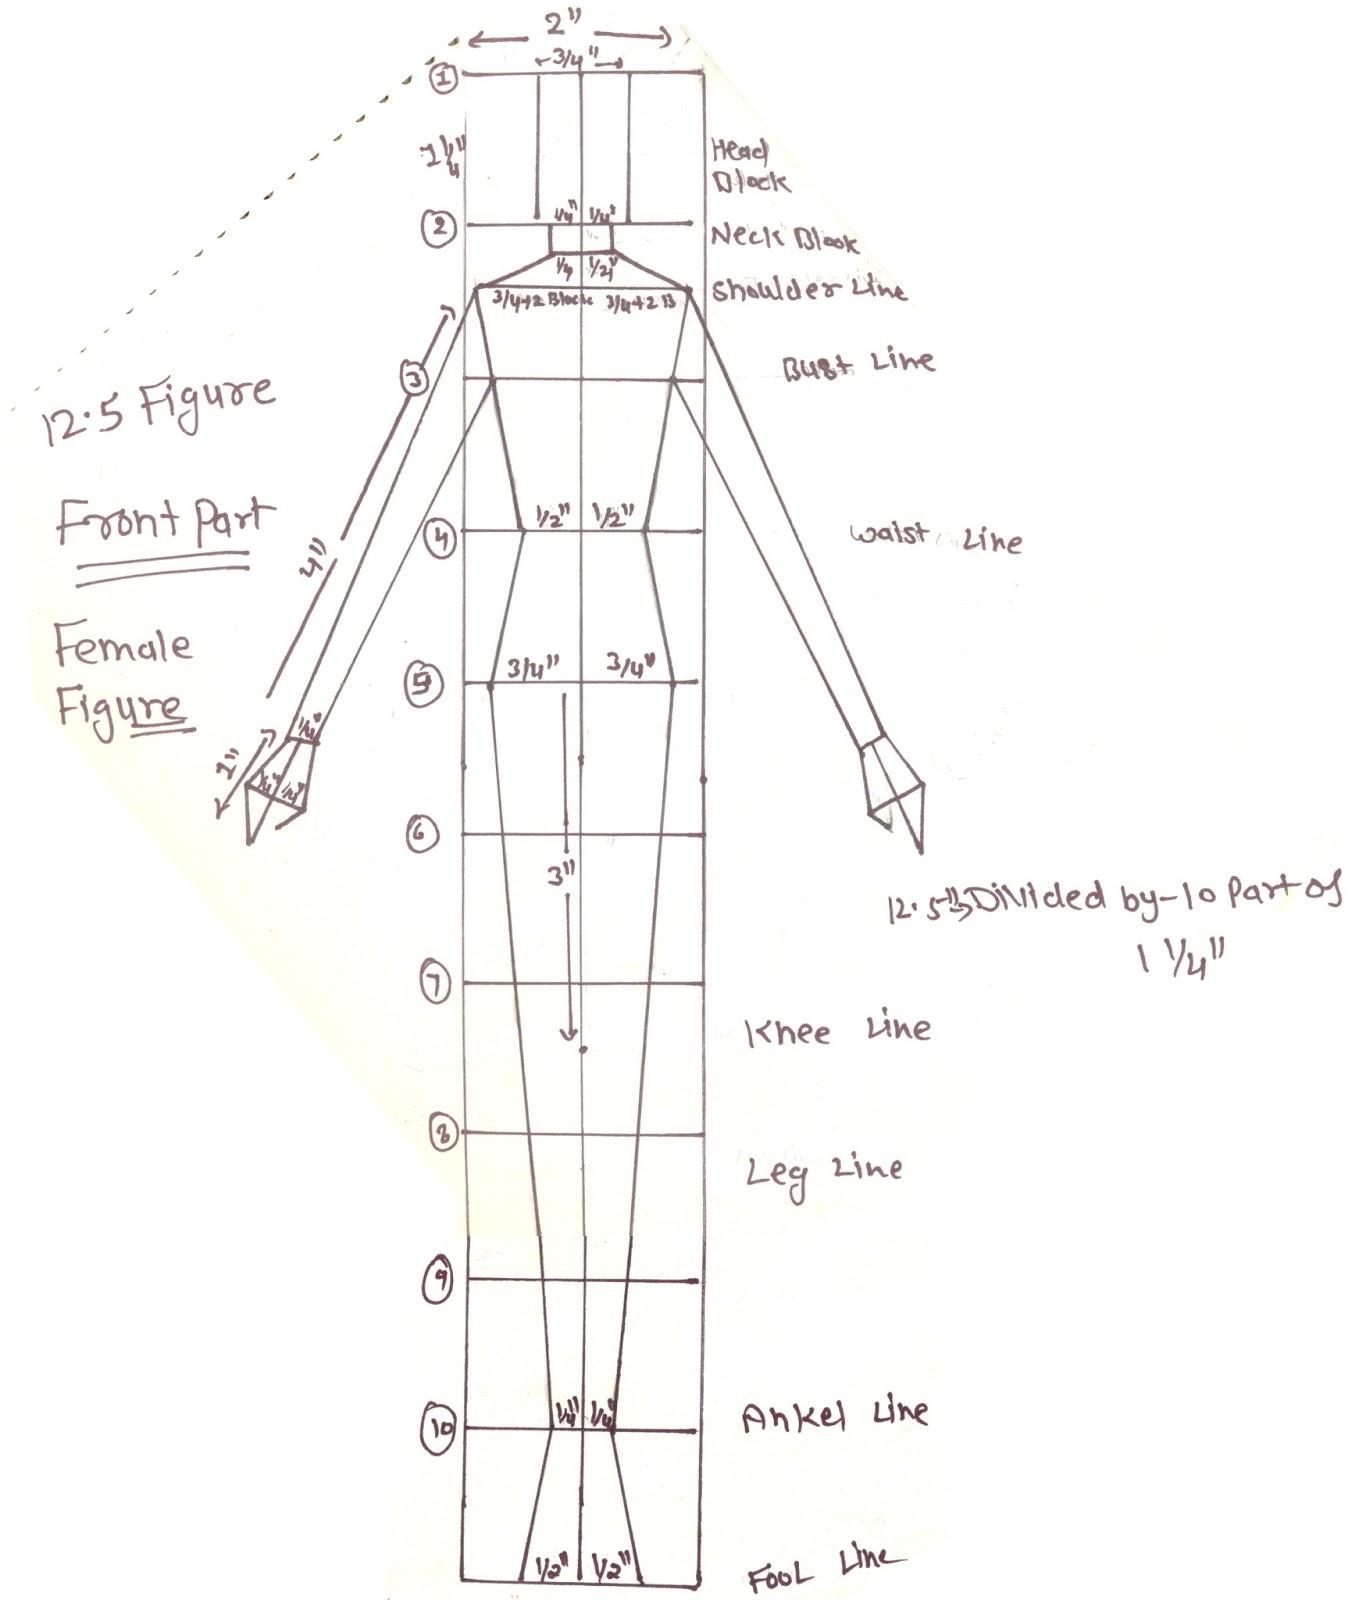 Sketch Diagram Online Printable Flower Fashion Education Design 12 5 Figure